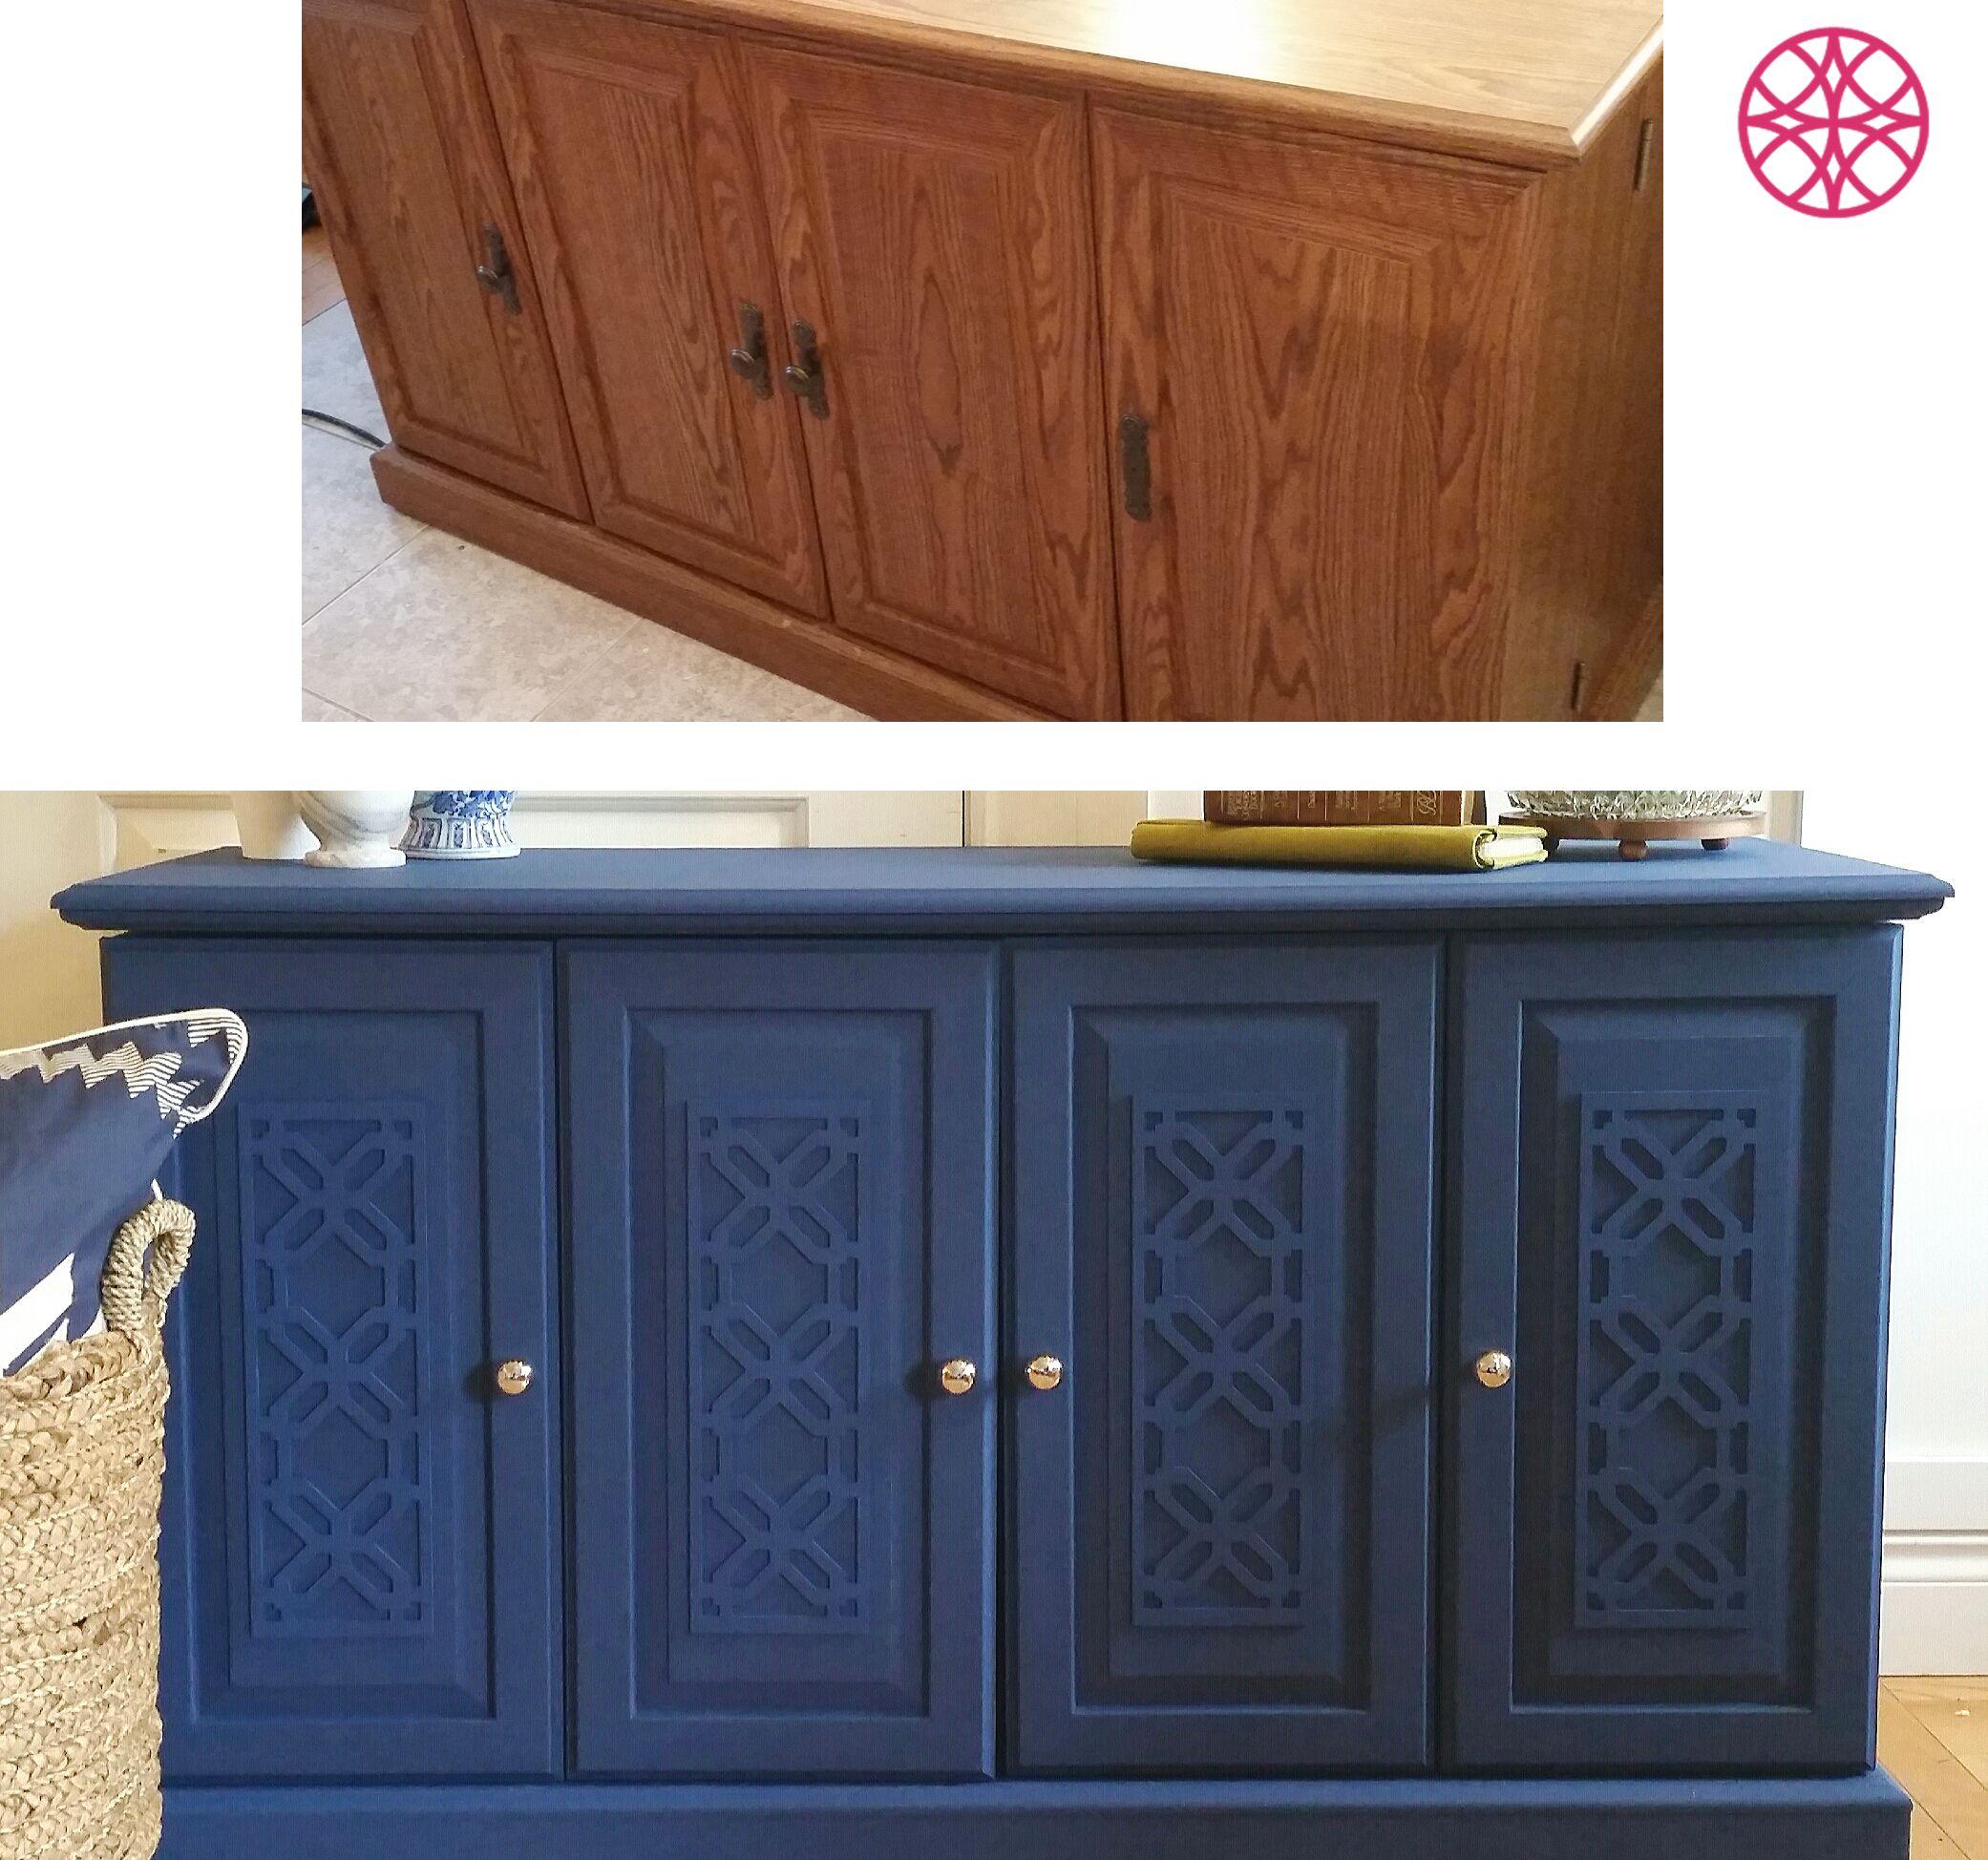 Find My Furniture: O'verlays Gigi Panel On A Yard Sale Find Painted Navy Blue